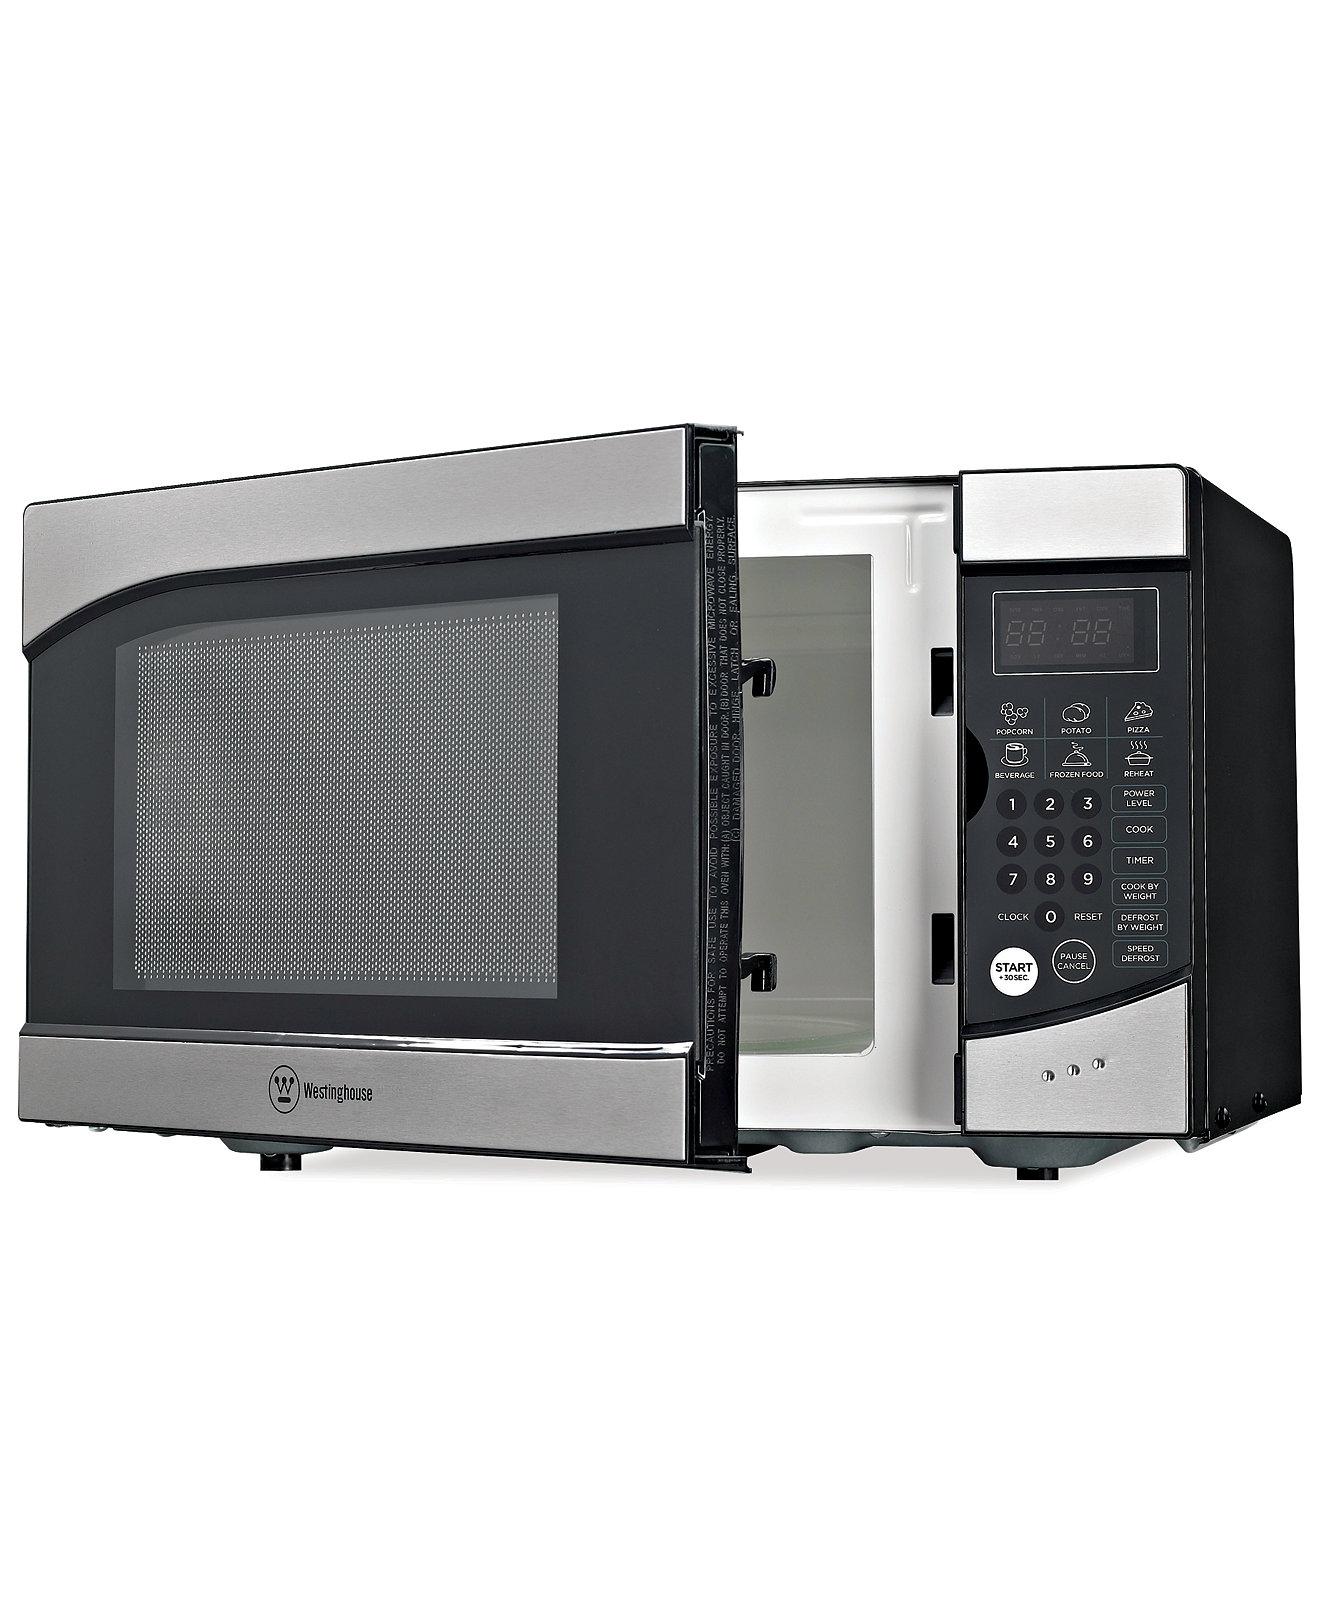 Macys Kitchen Appliances Westinghouse Mw009 Microwave 900 Watt Electrics Kitchen